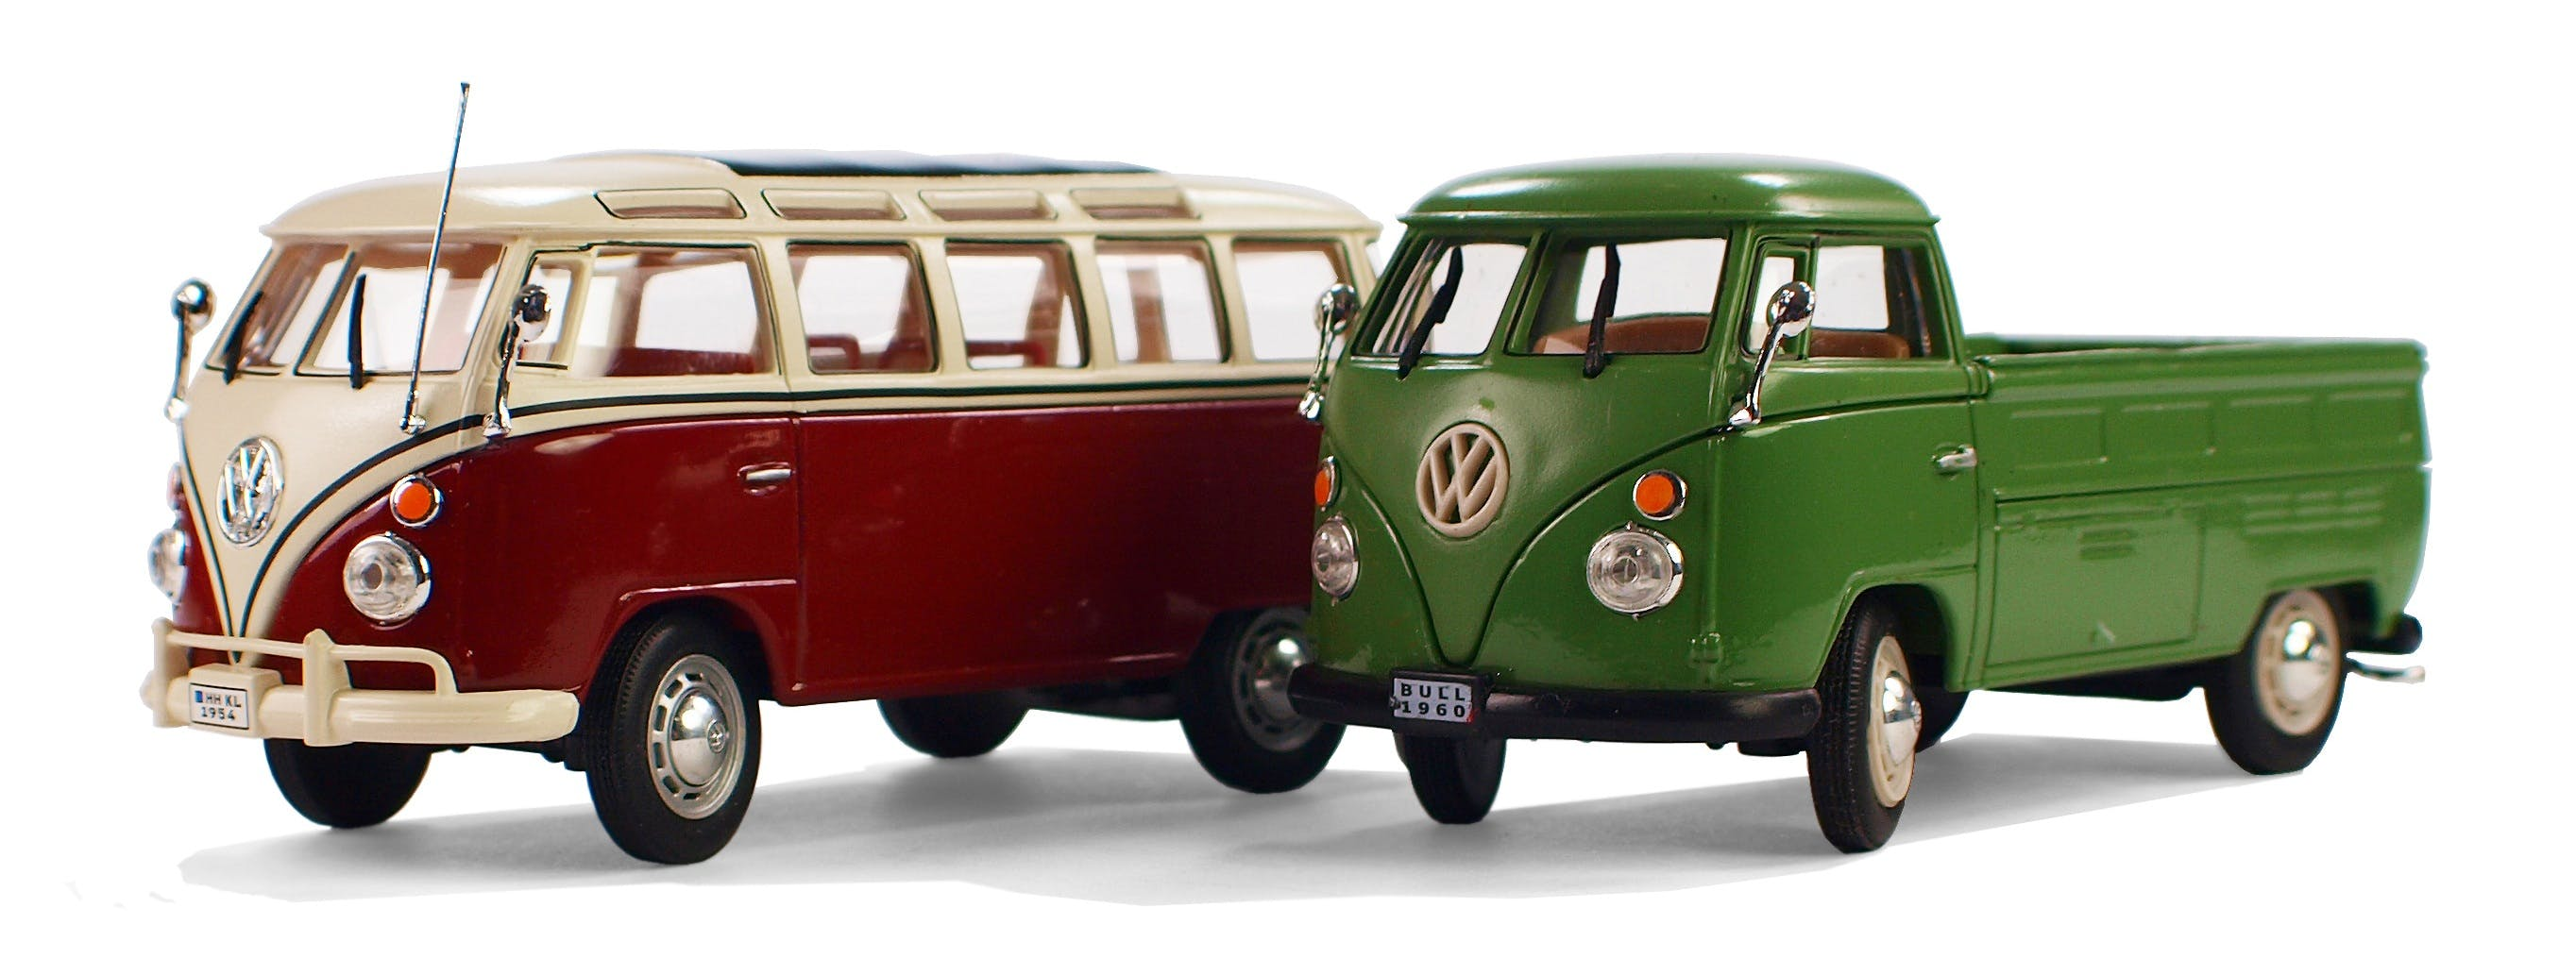 Two Red Volkswagen T2 and Green Volkswagen T1 Die-cast Models